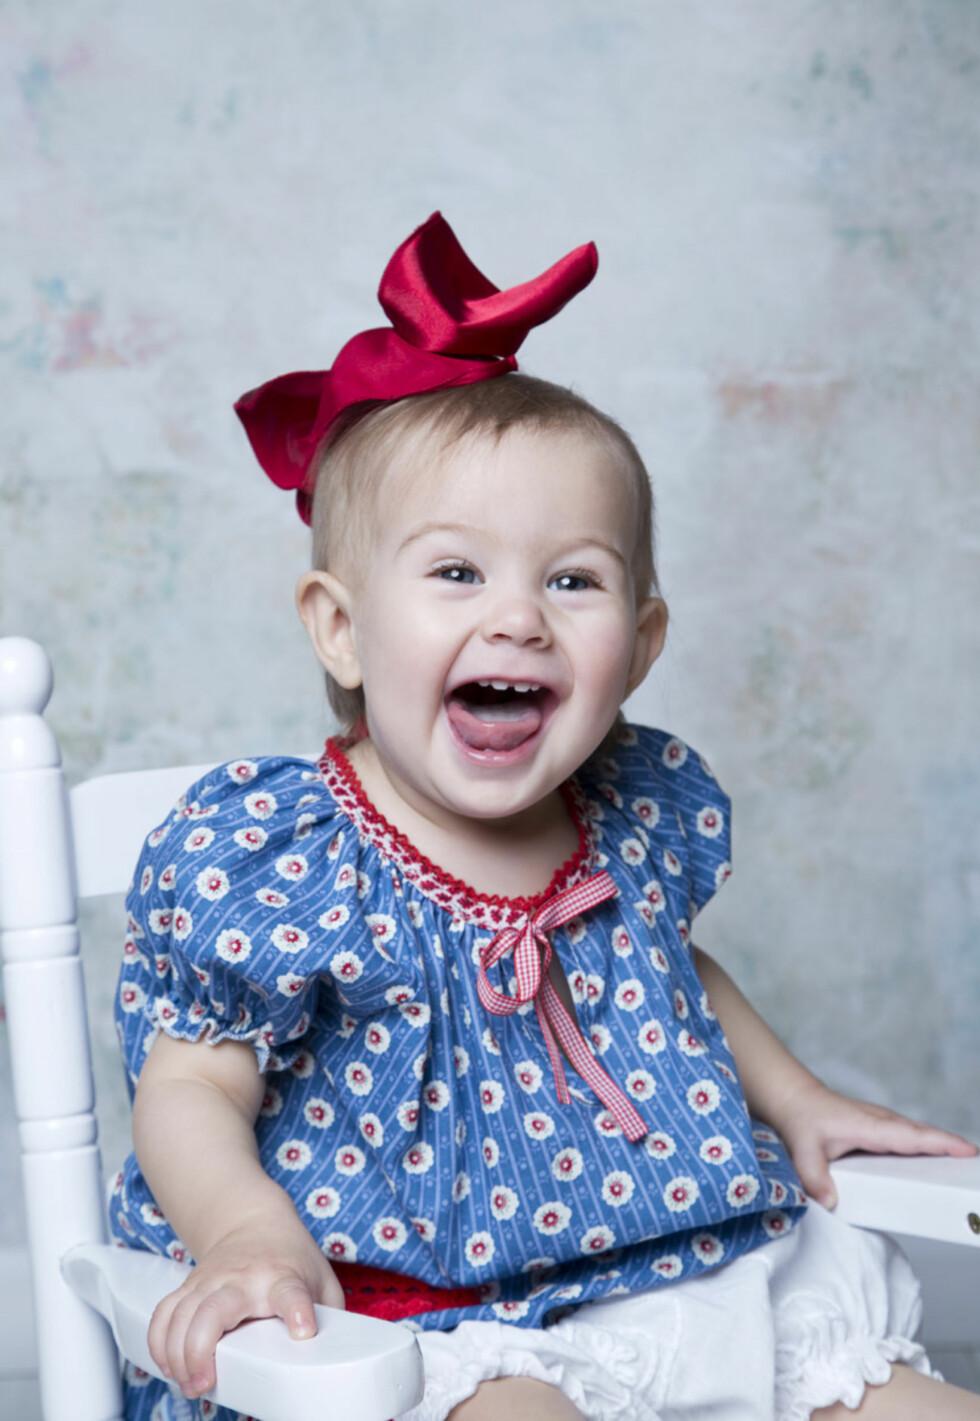 STORTRIVDES I FOTOSTUDIO: – Babyer er de beste kundene mine, sier Natalia. Foto: Fotograf Natalia Pipkina